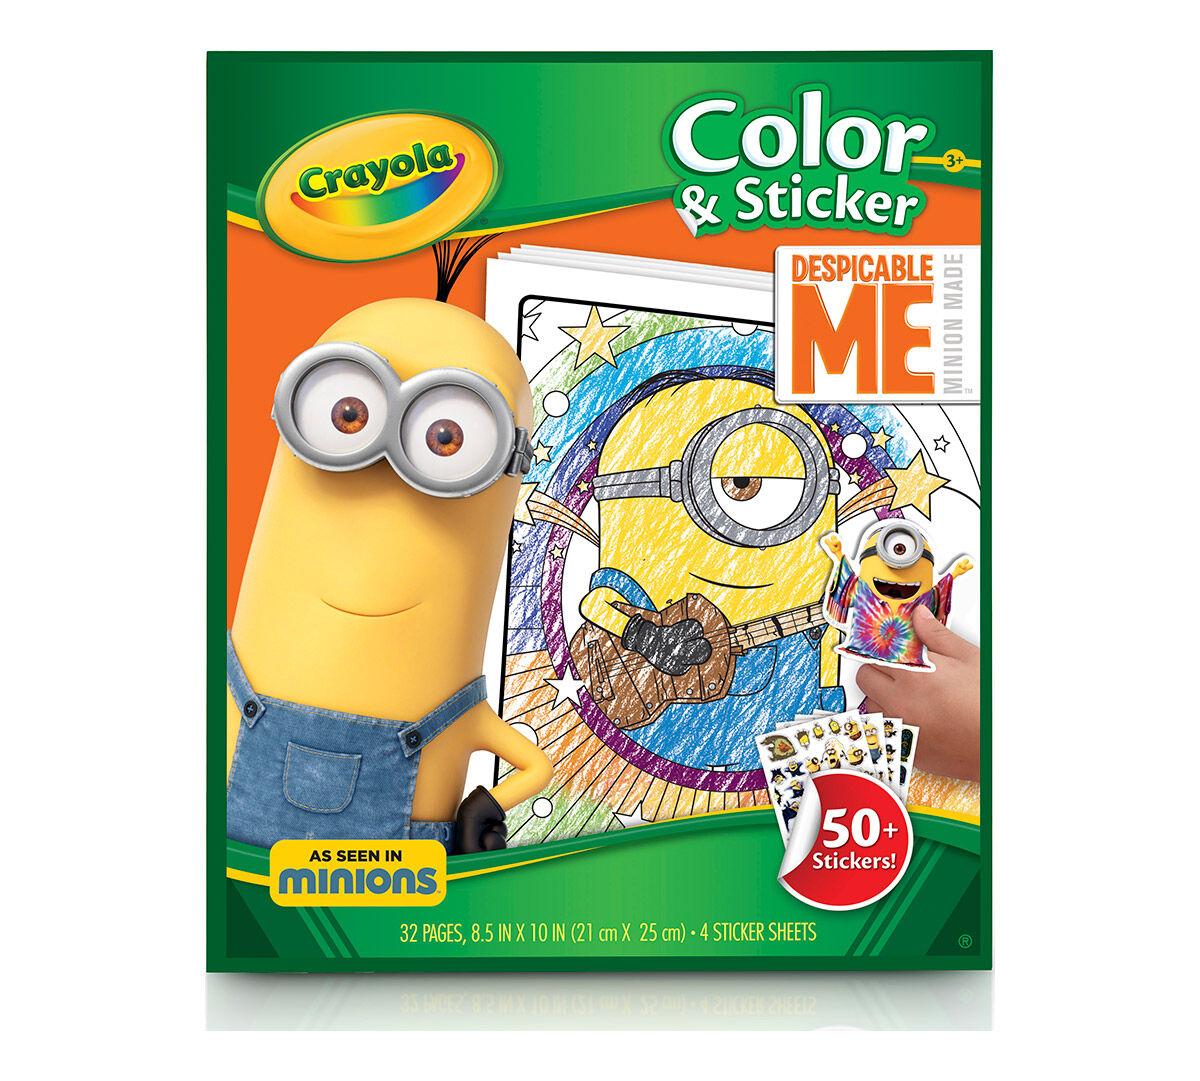 color sticker despicable me - Crayola Color Alive Pages Minions